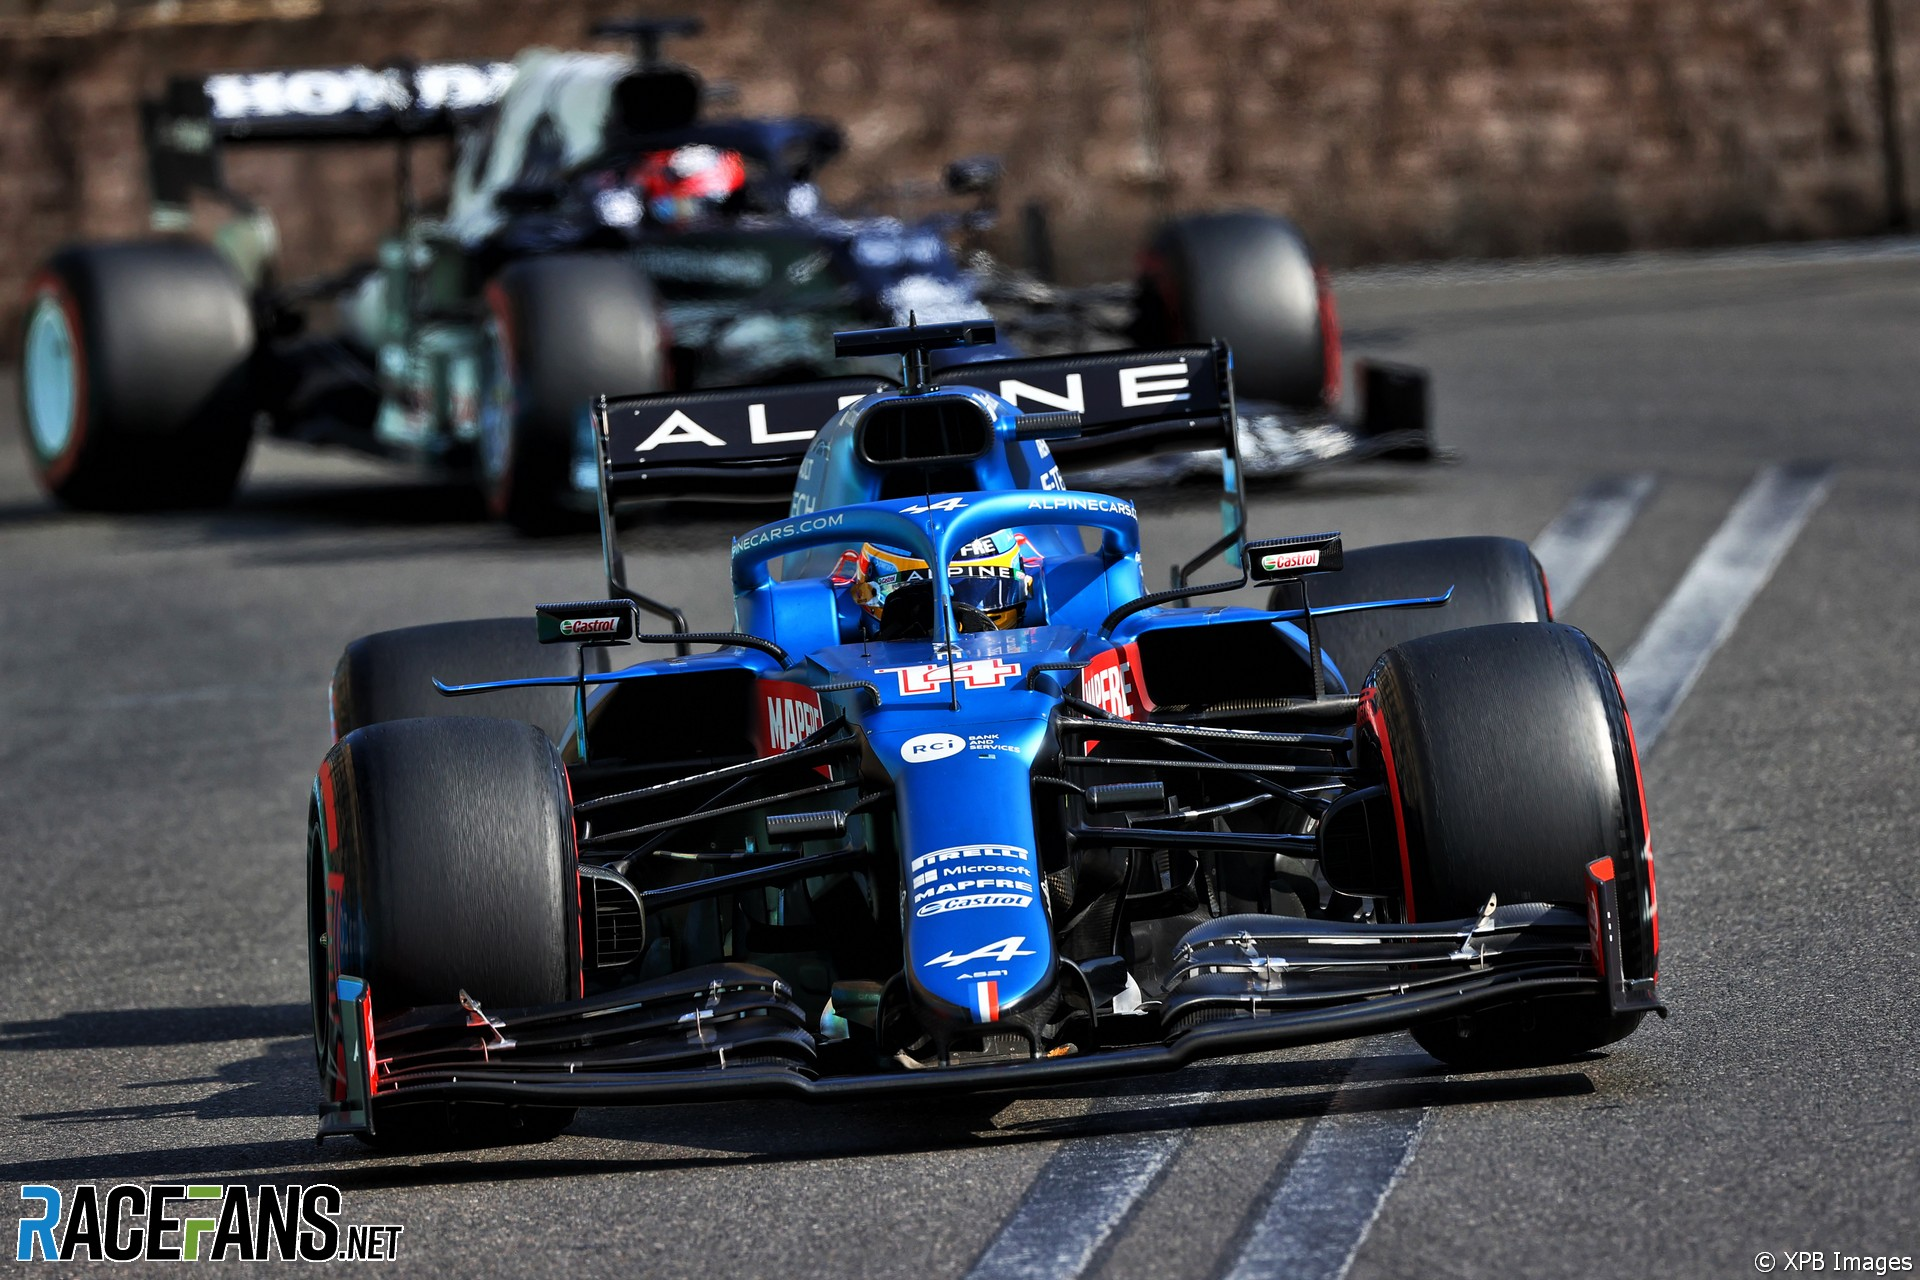 Fernando Alonso, Alpine, Baku City Circuit, 2021